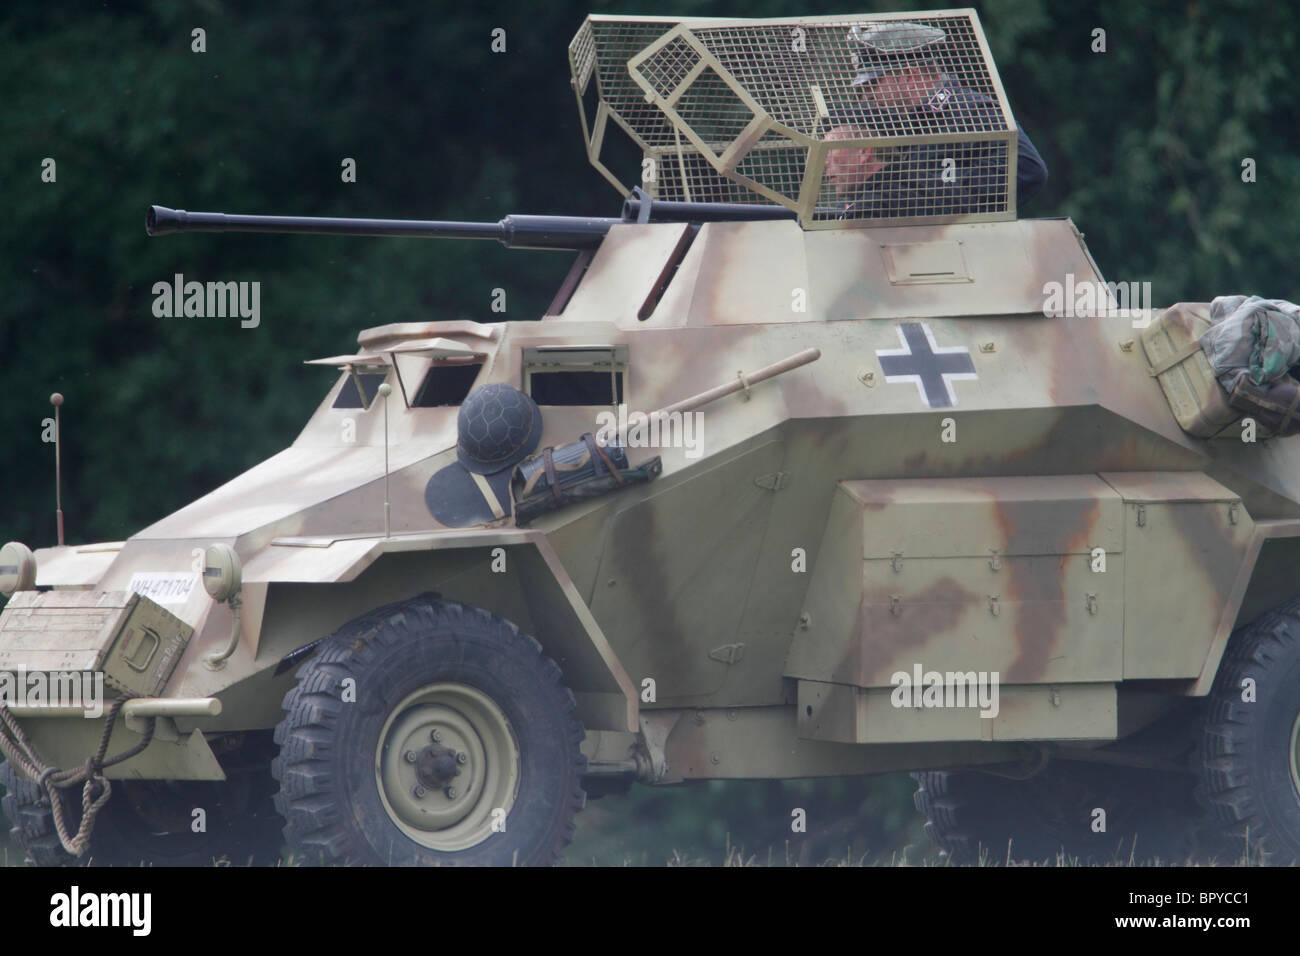 WWII re-enactment. A German Sd.Kfz. 223 Light armoured car Festival of History 2010, Kelmarsh Hall, Northamptonshire. - Stock Image